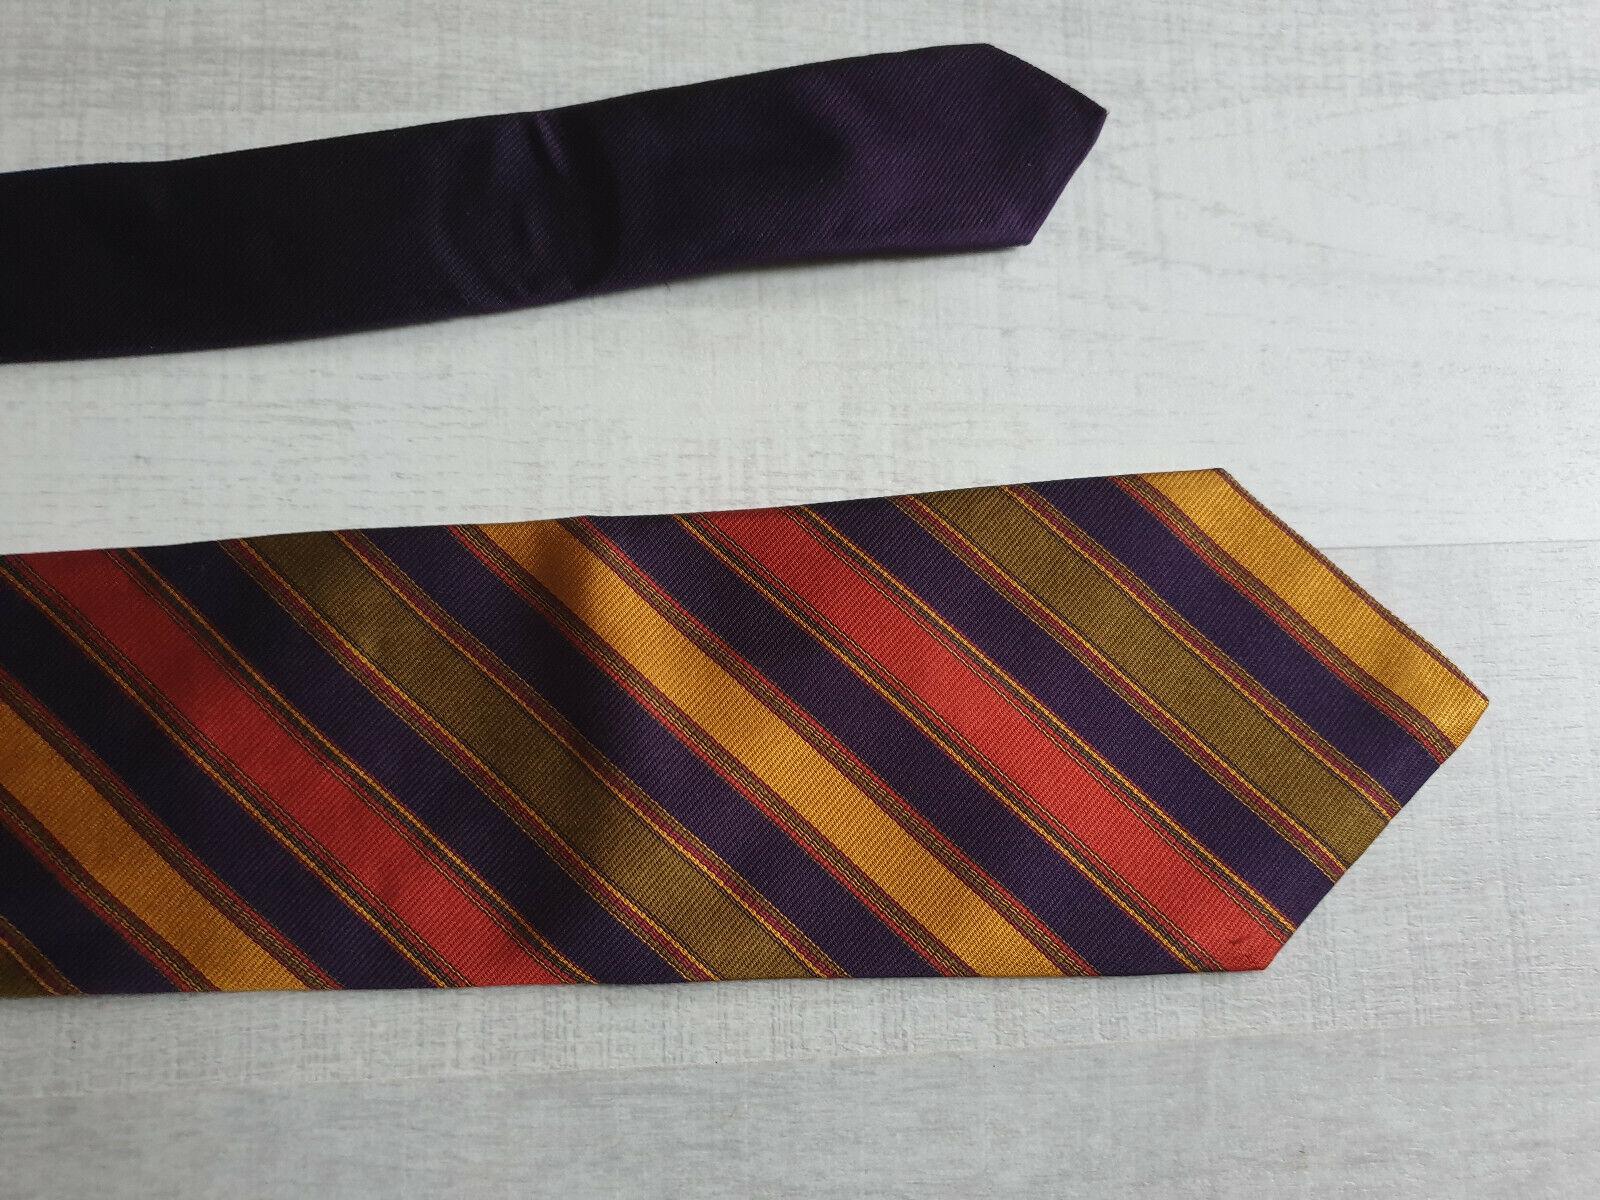 Cravate homme - kenzo - 100% soie